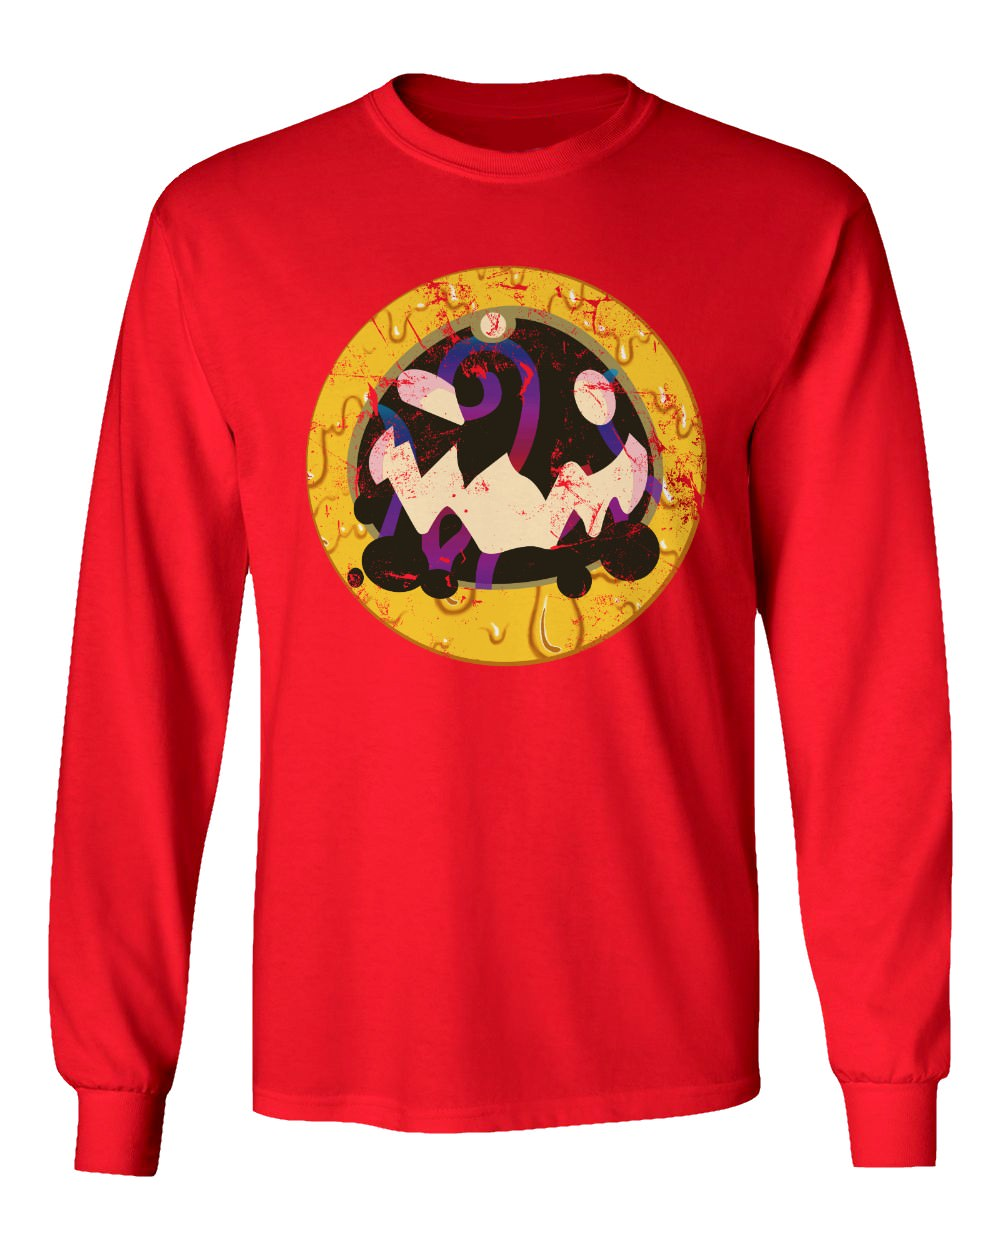 Details about Slime Rancher Shirt Slimes Tarr Video Game Men's Long Sleeve  T-Shirt